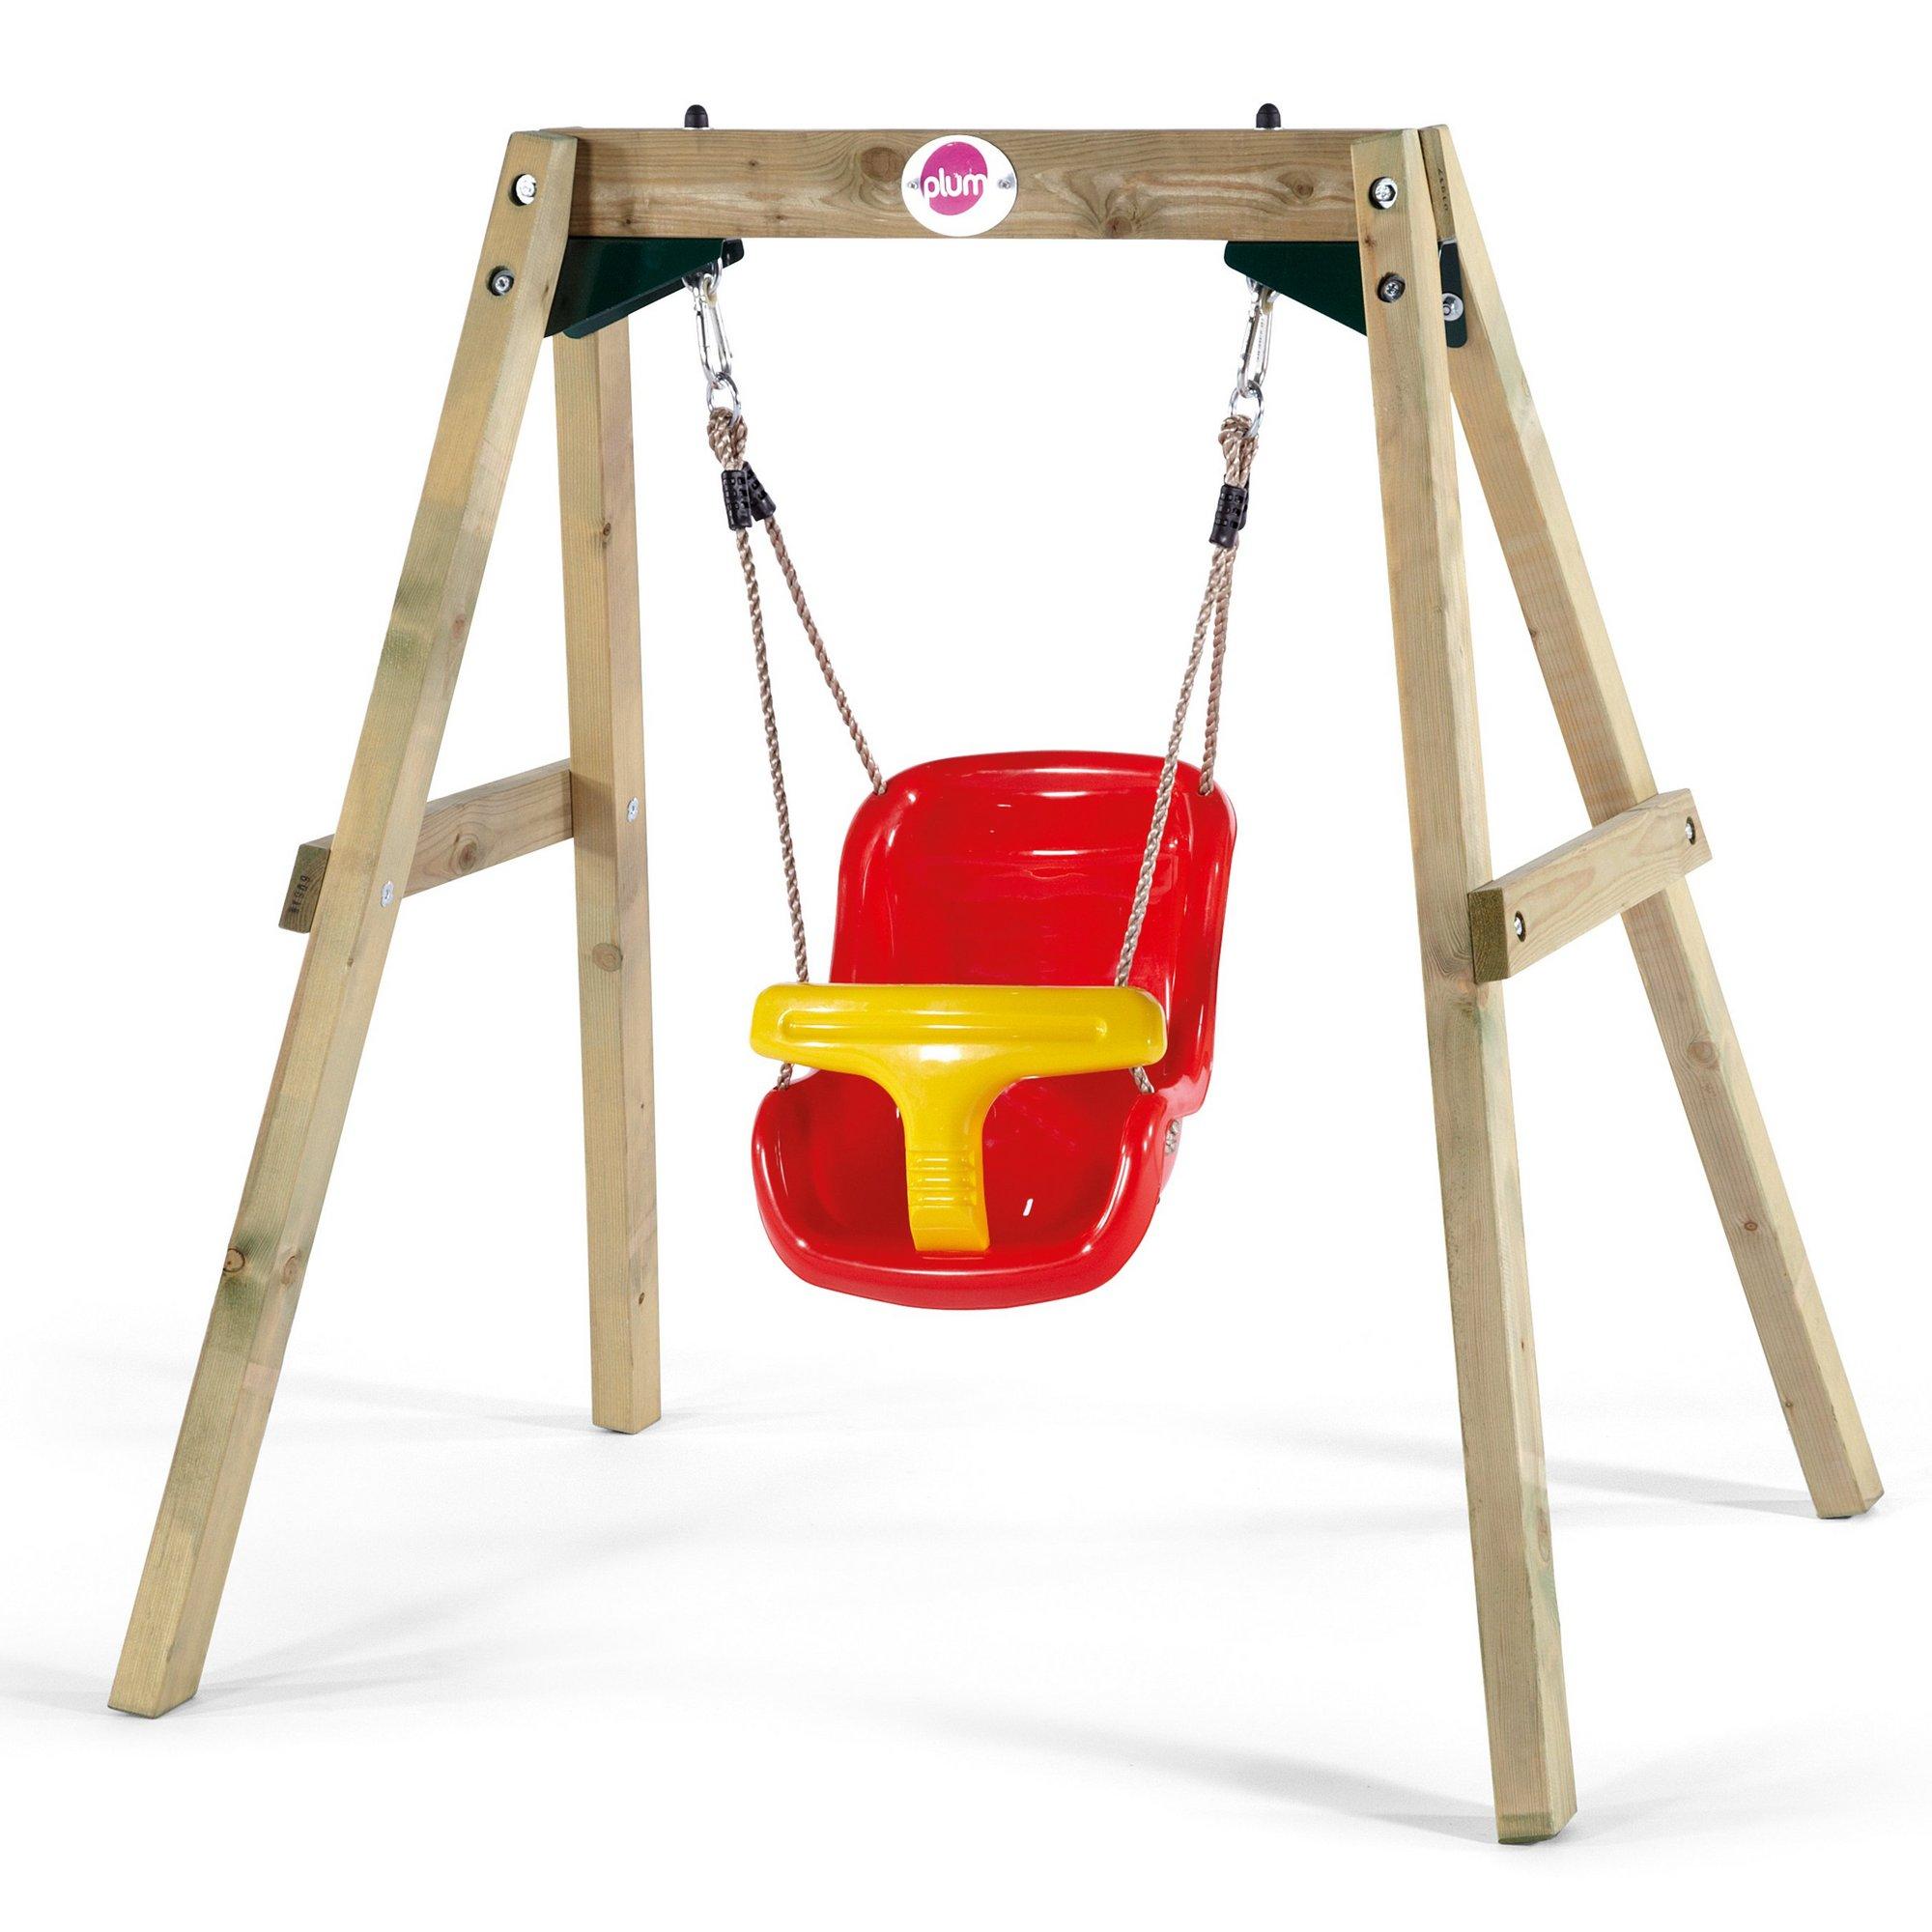 Image of Plum Wooden Baby Swing Set